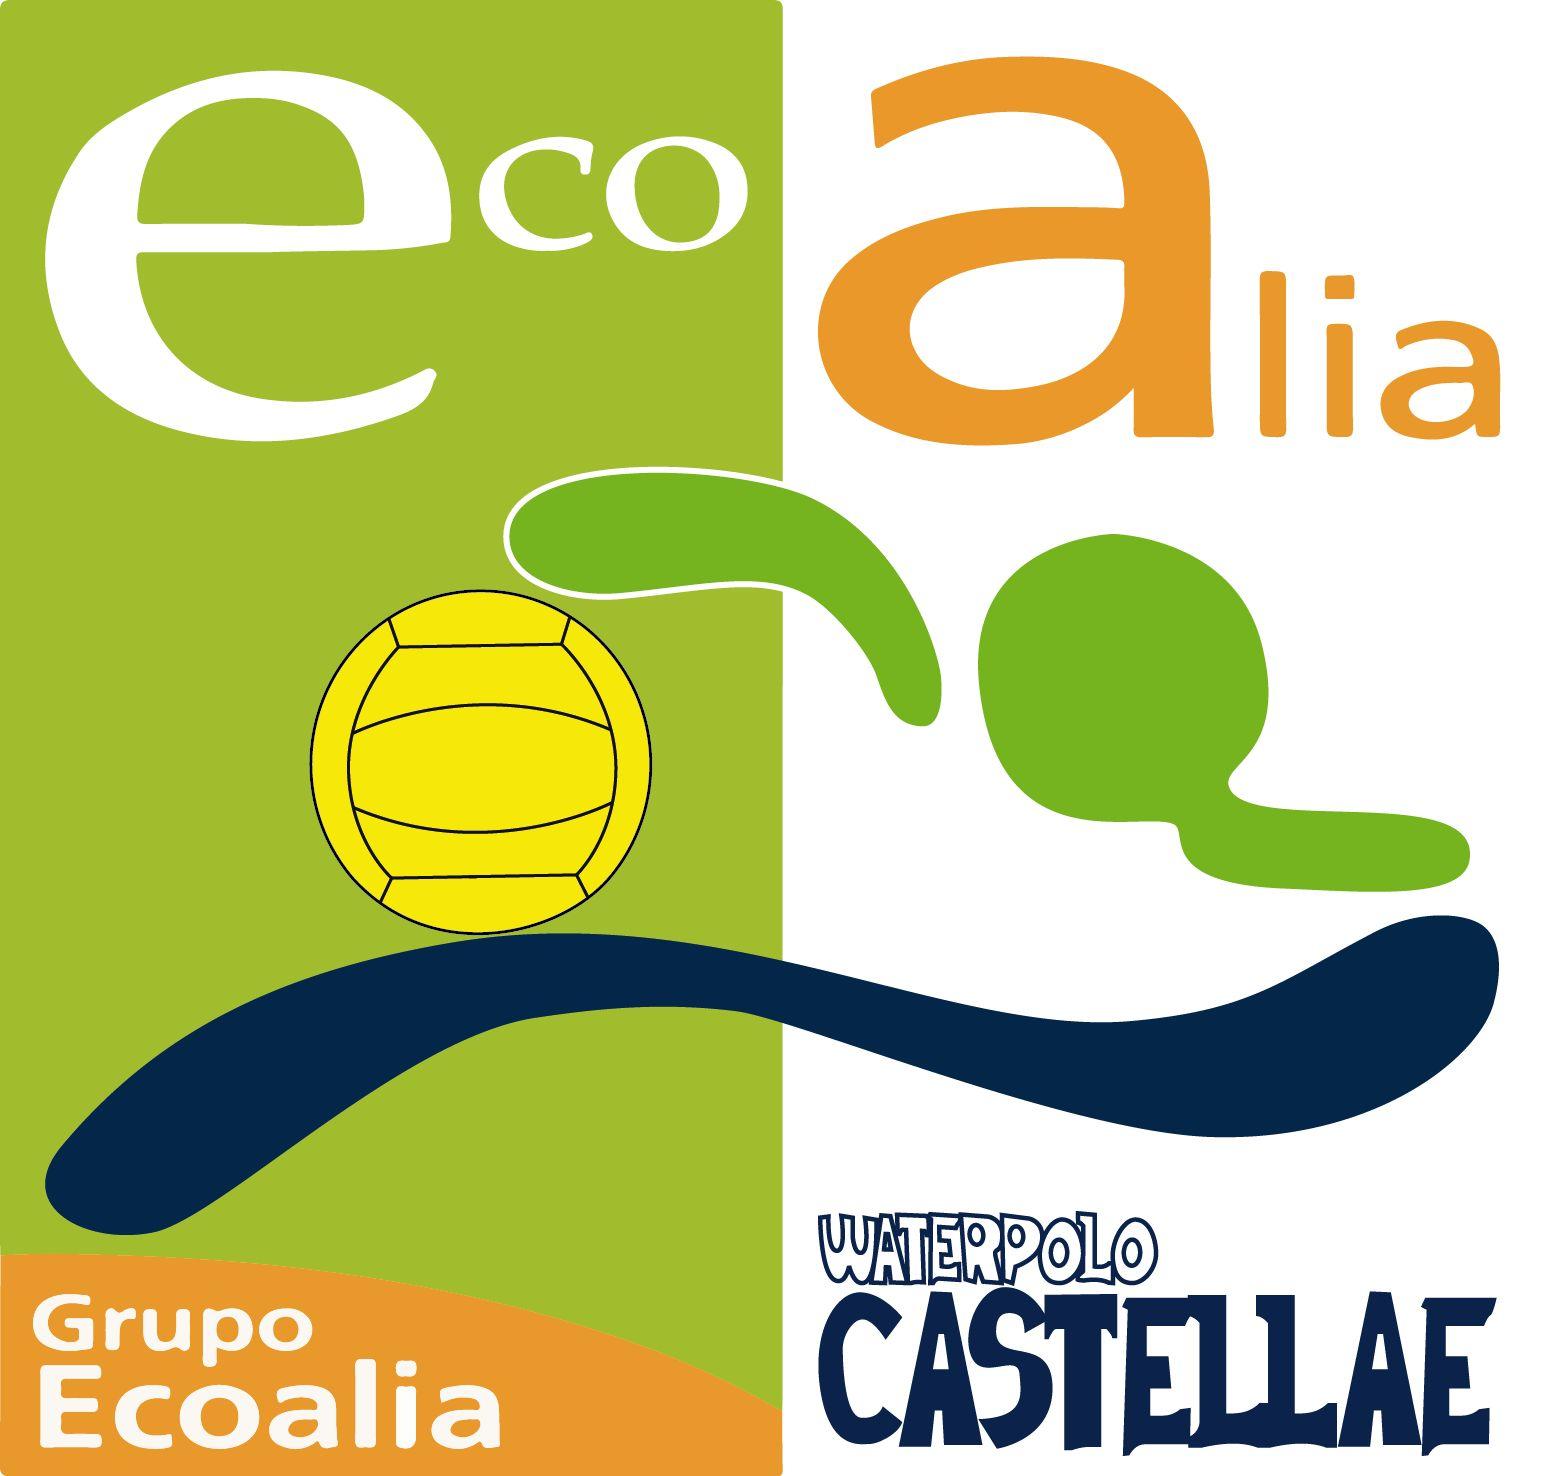 Ecoalia-Castellae